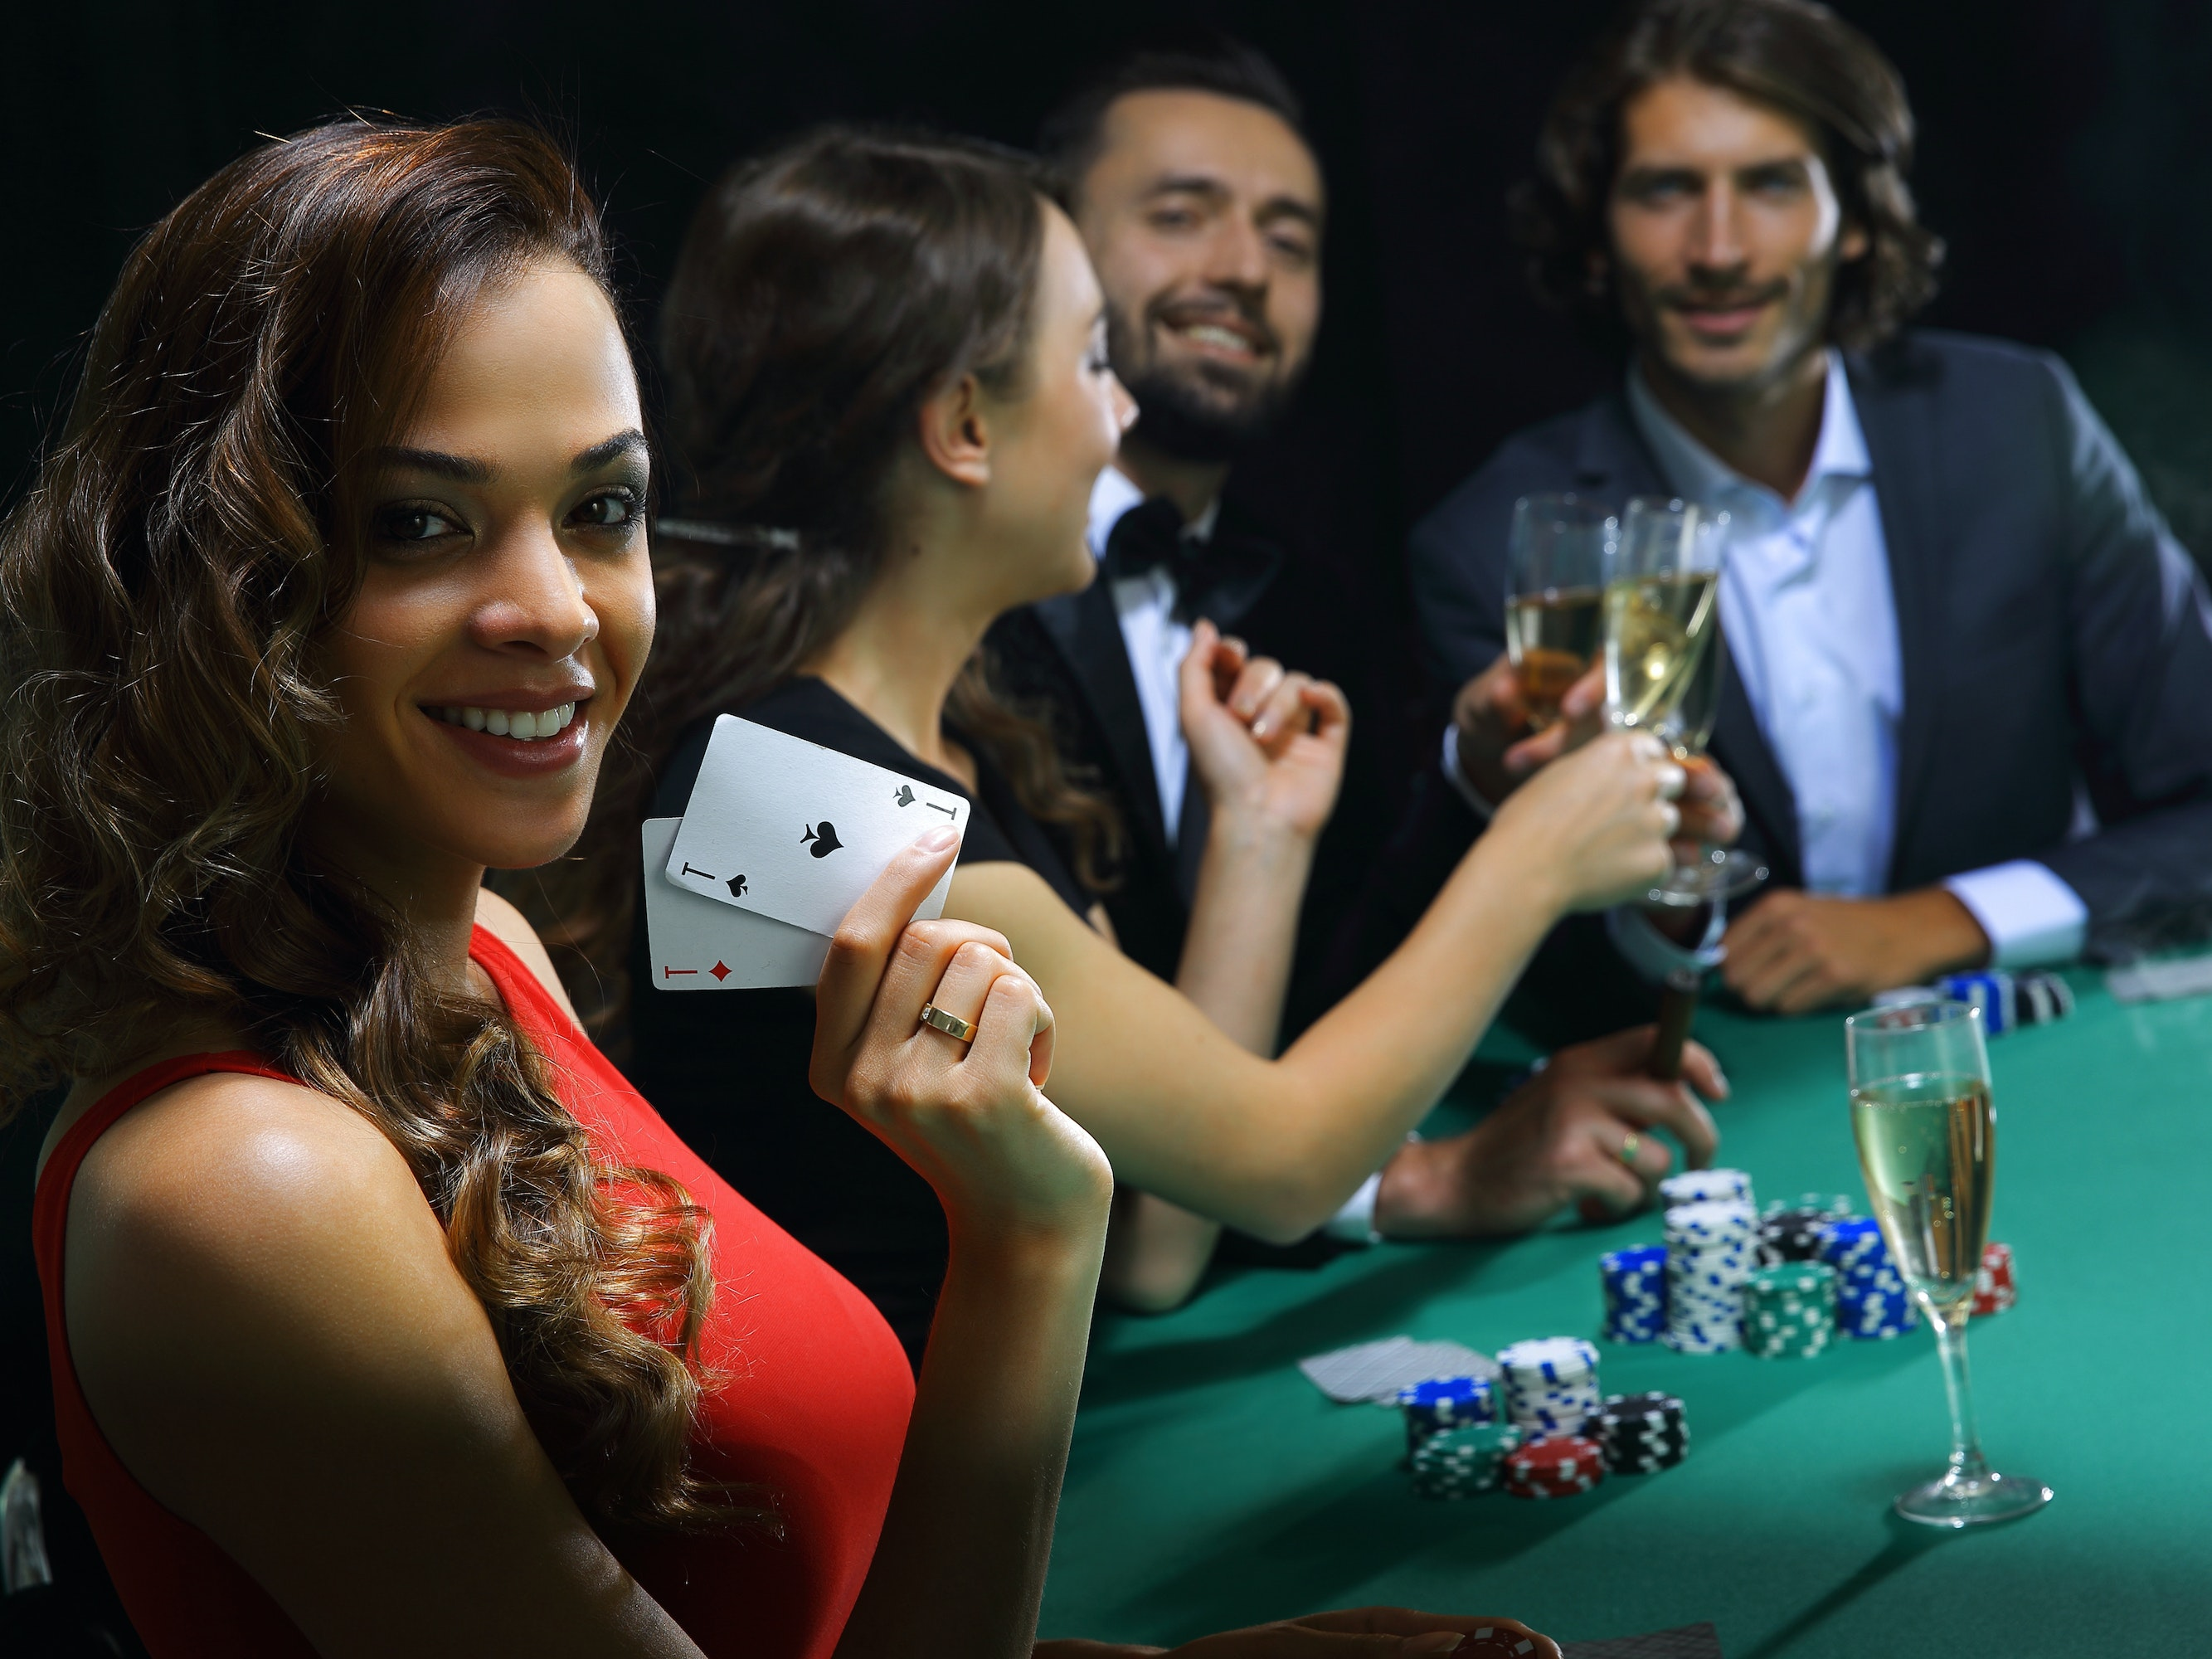 Dana white plays blackjack